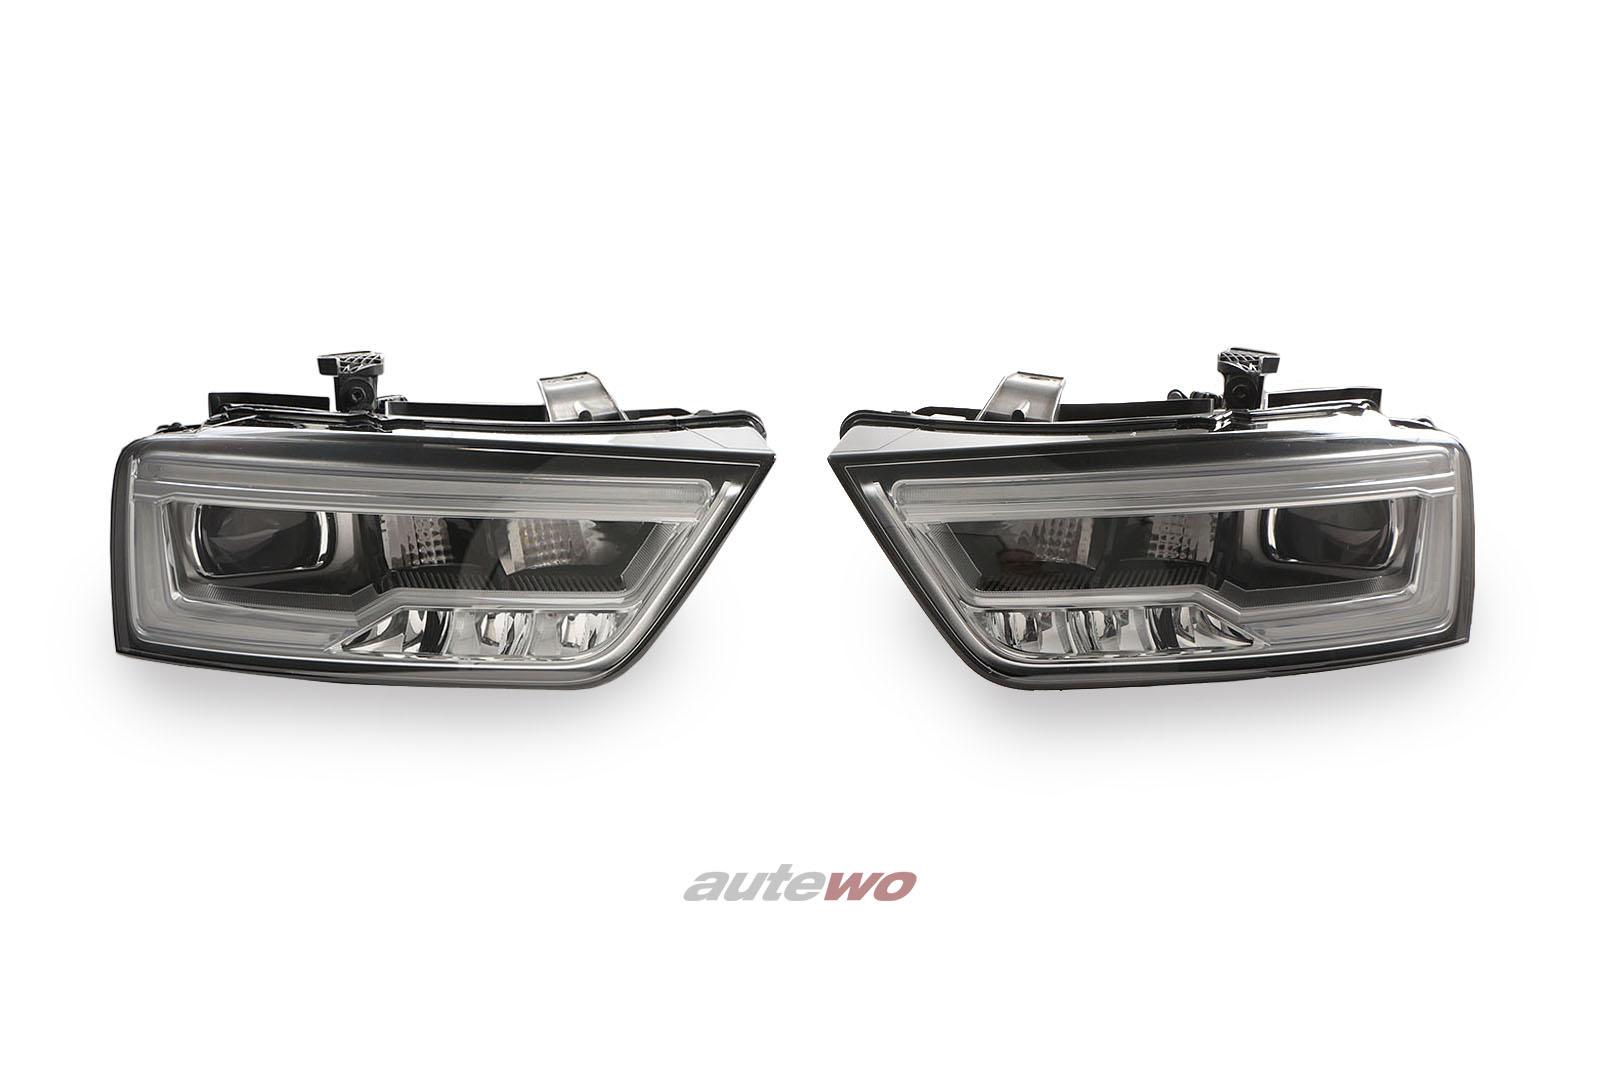 8U0941033/8U0941034 Audi Q3 8U Xenon LED Scheinwerfer Links & Rechts